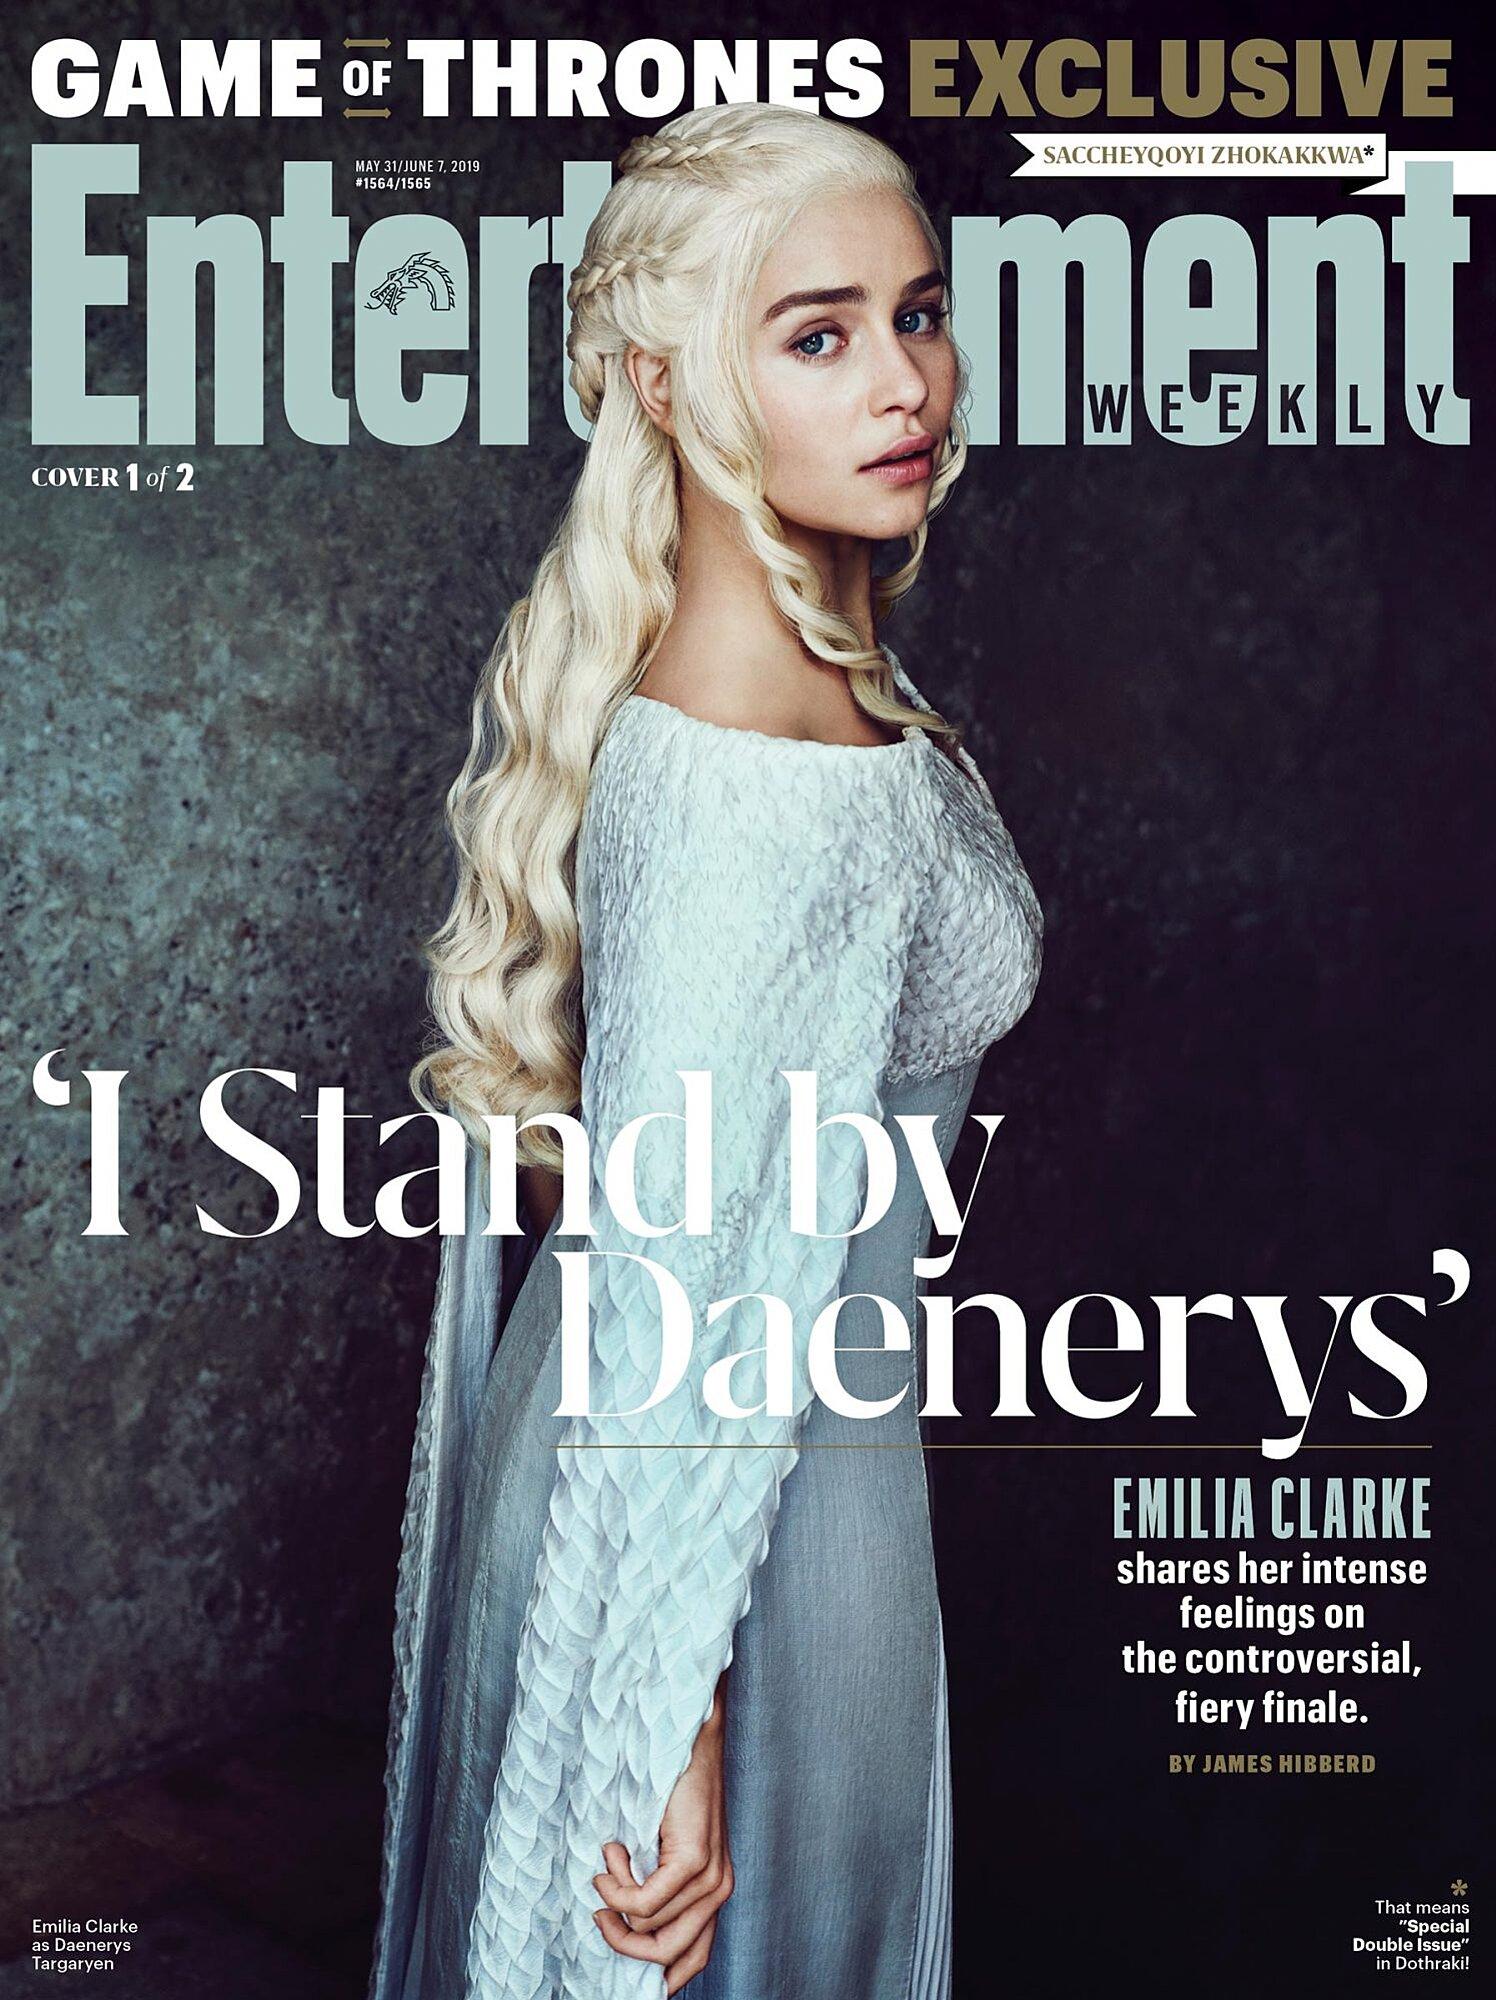 24+ Game Of Thrones Season 8 Episode 1 Reddit Stream  Pics